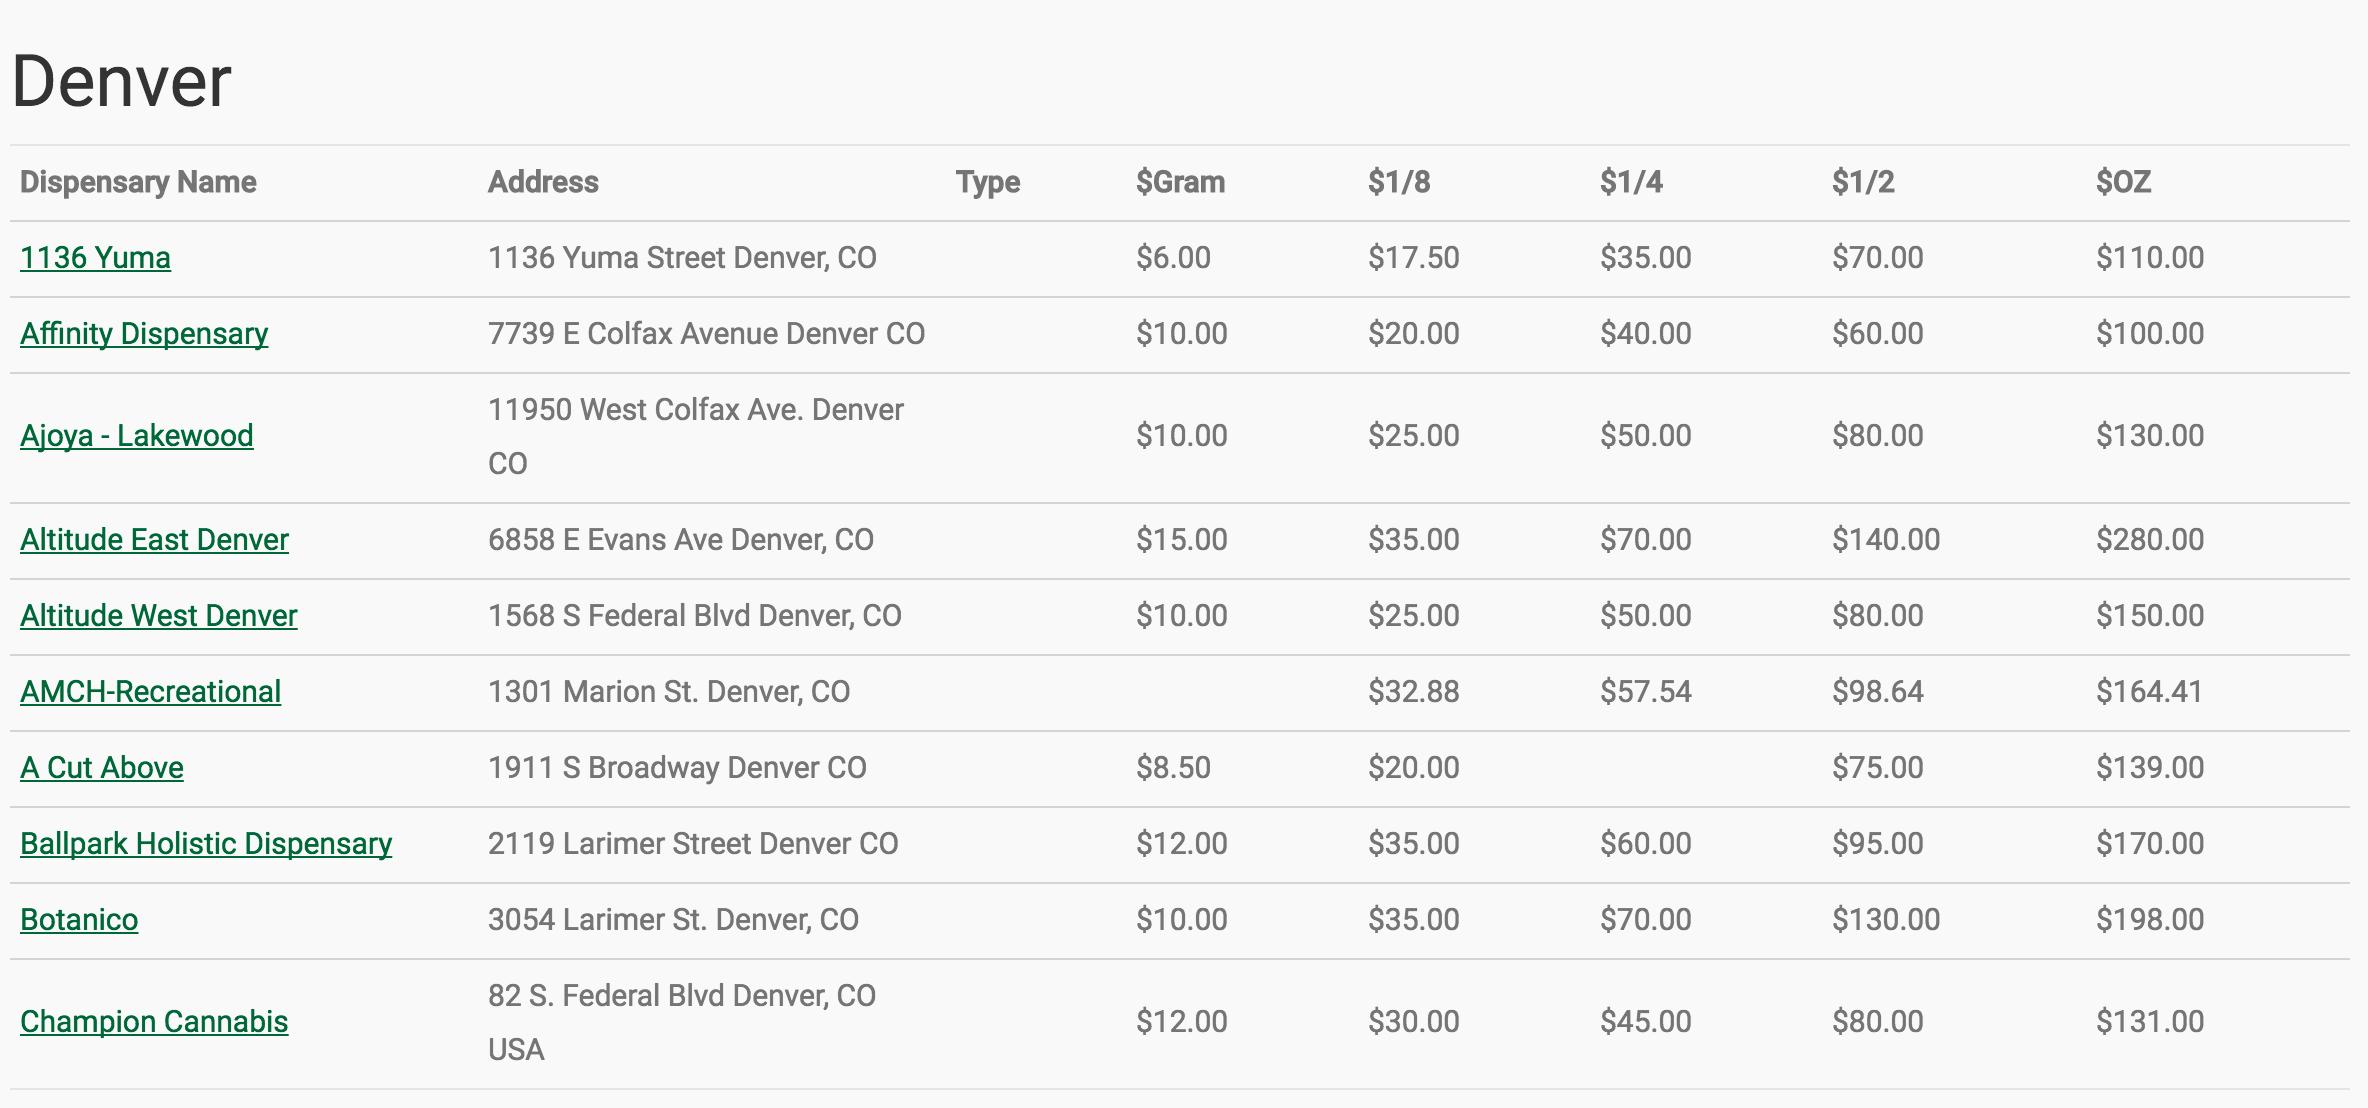 Denver marijuana prices